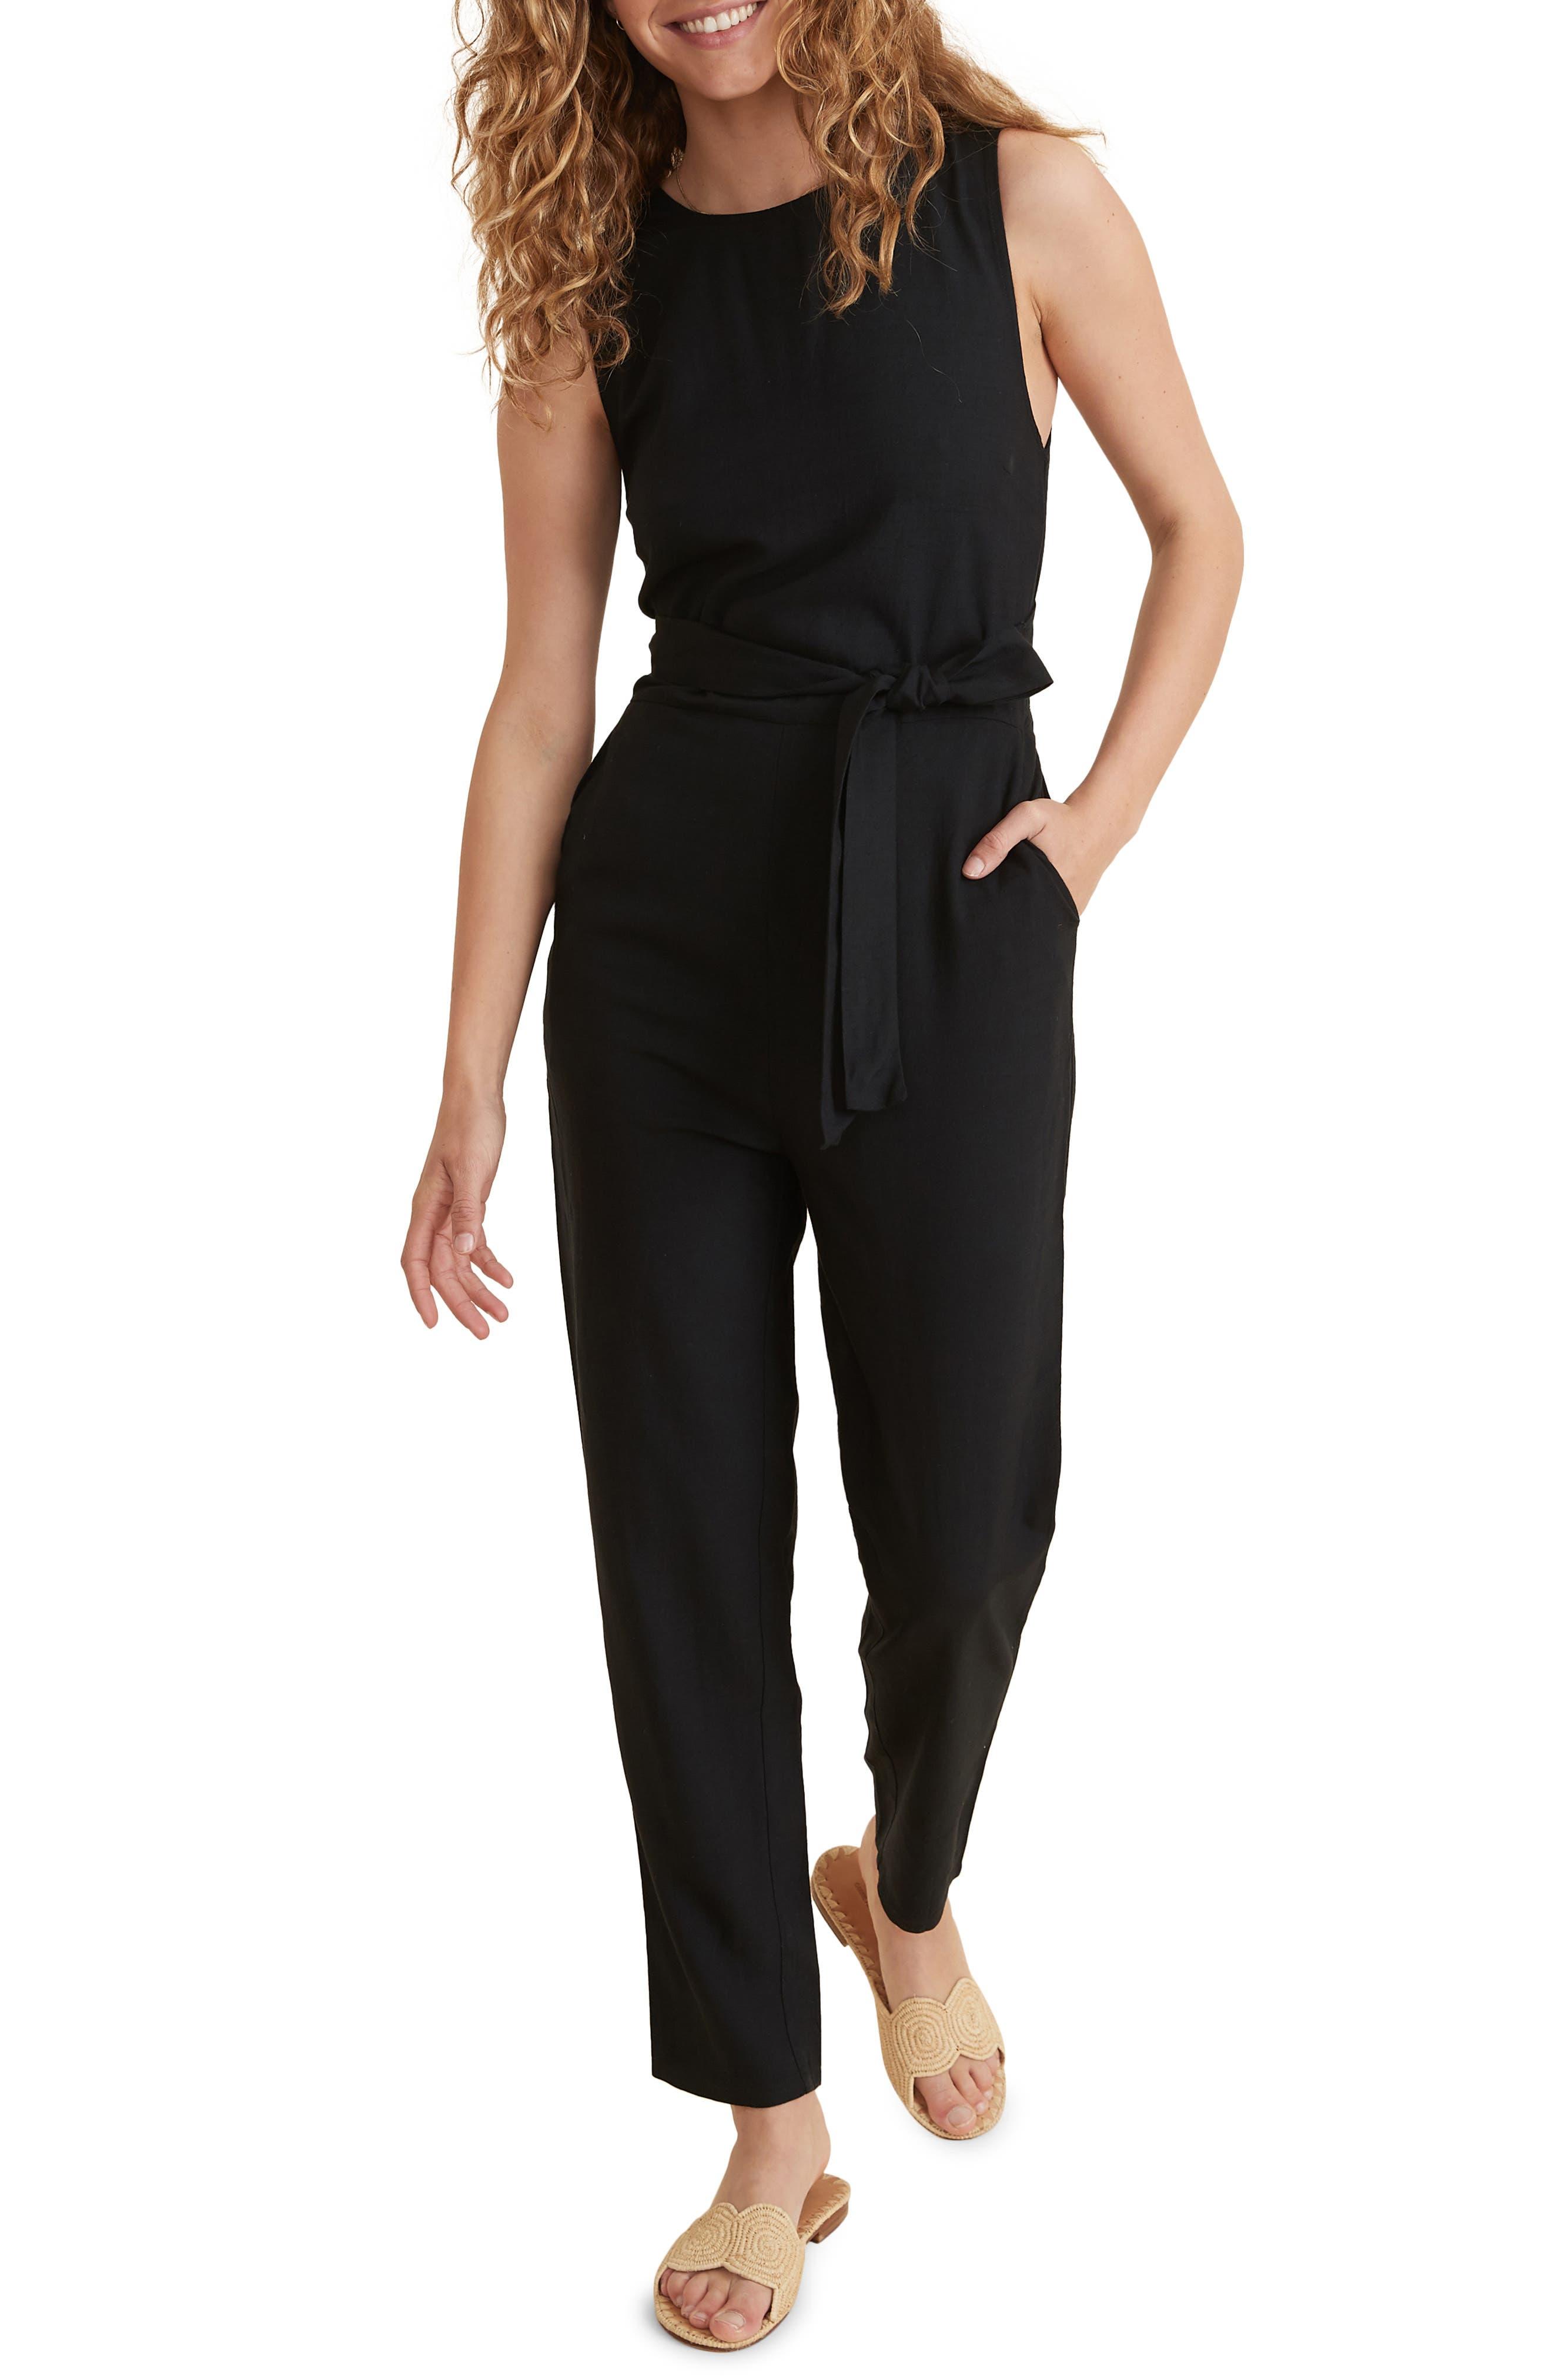 Eloise Belted Jumpsuit